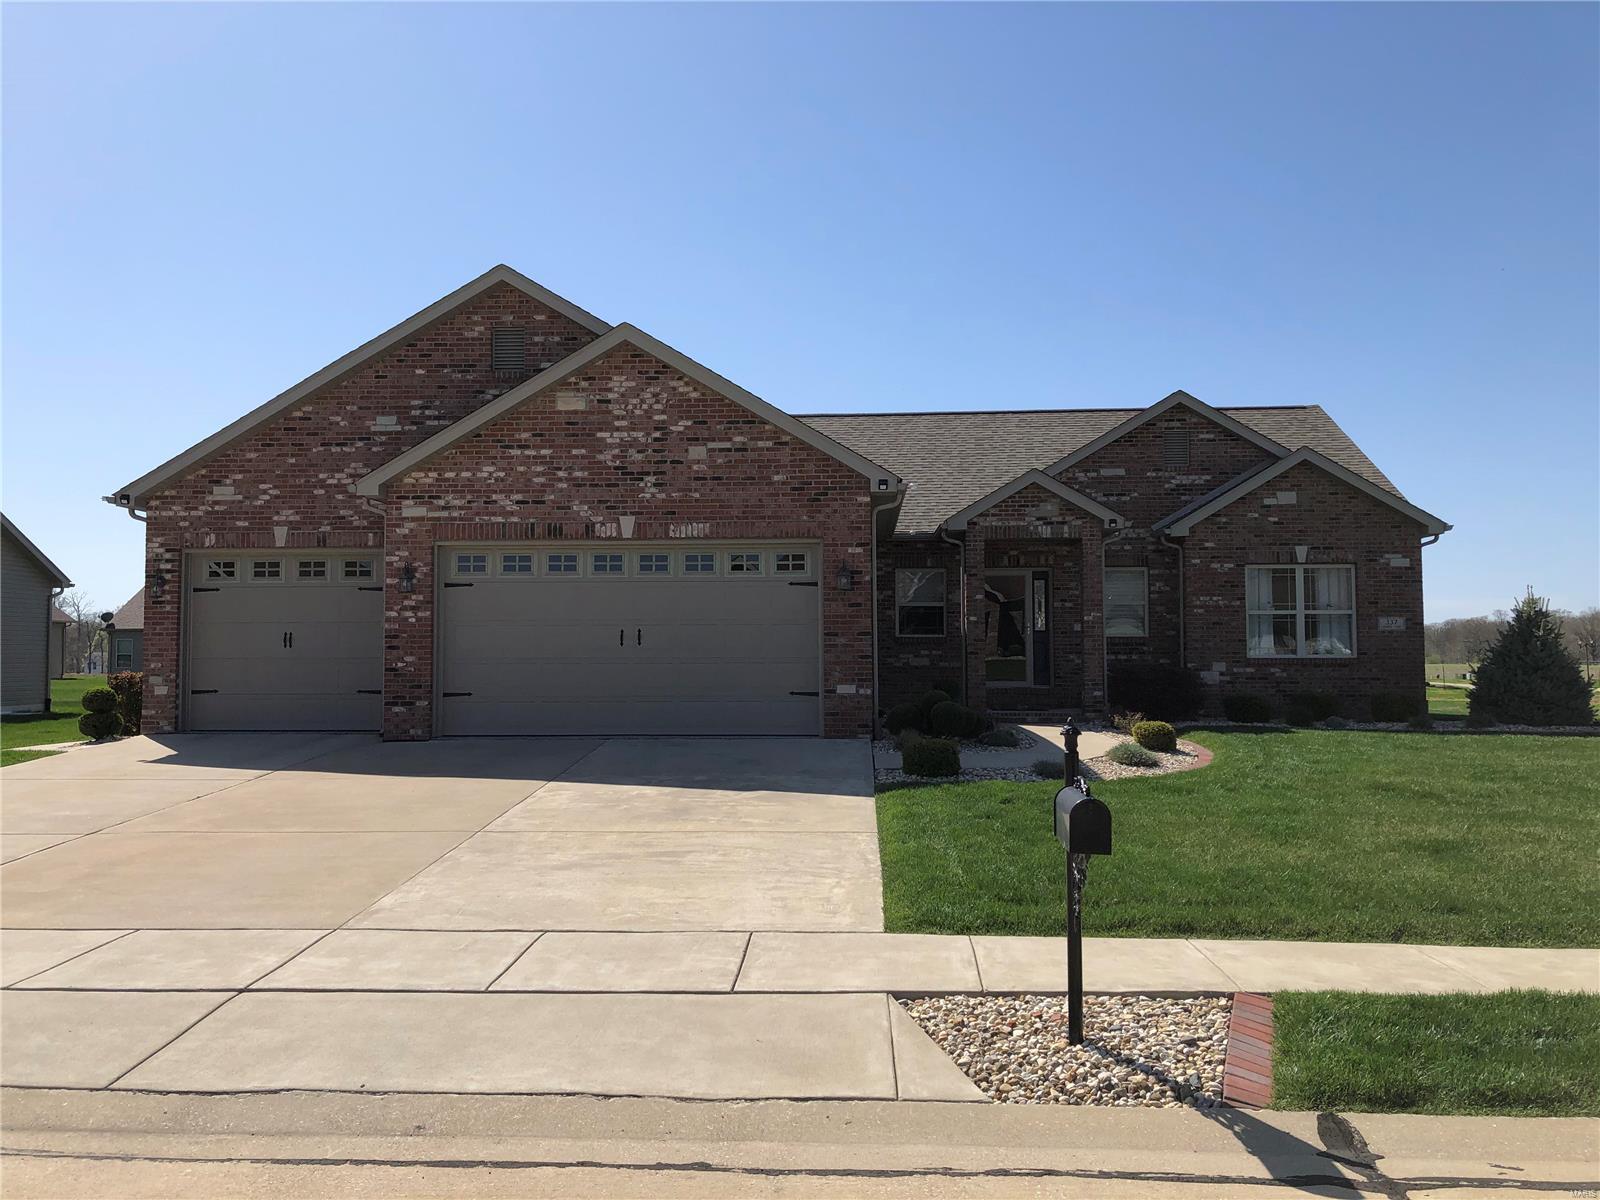 337 Gadwall Property Photo - Staunton, IL real estate listing